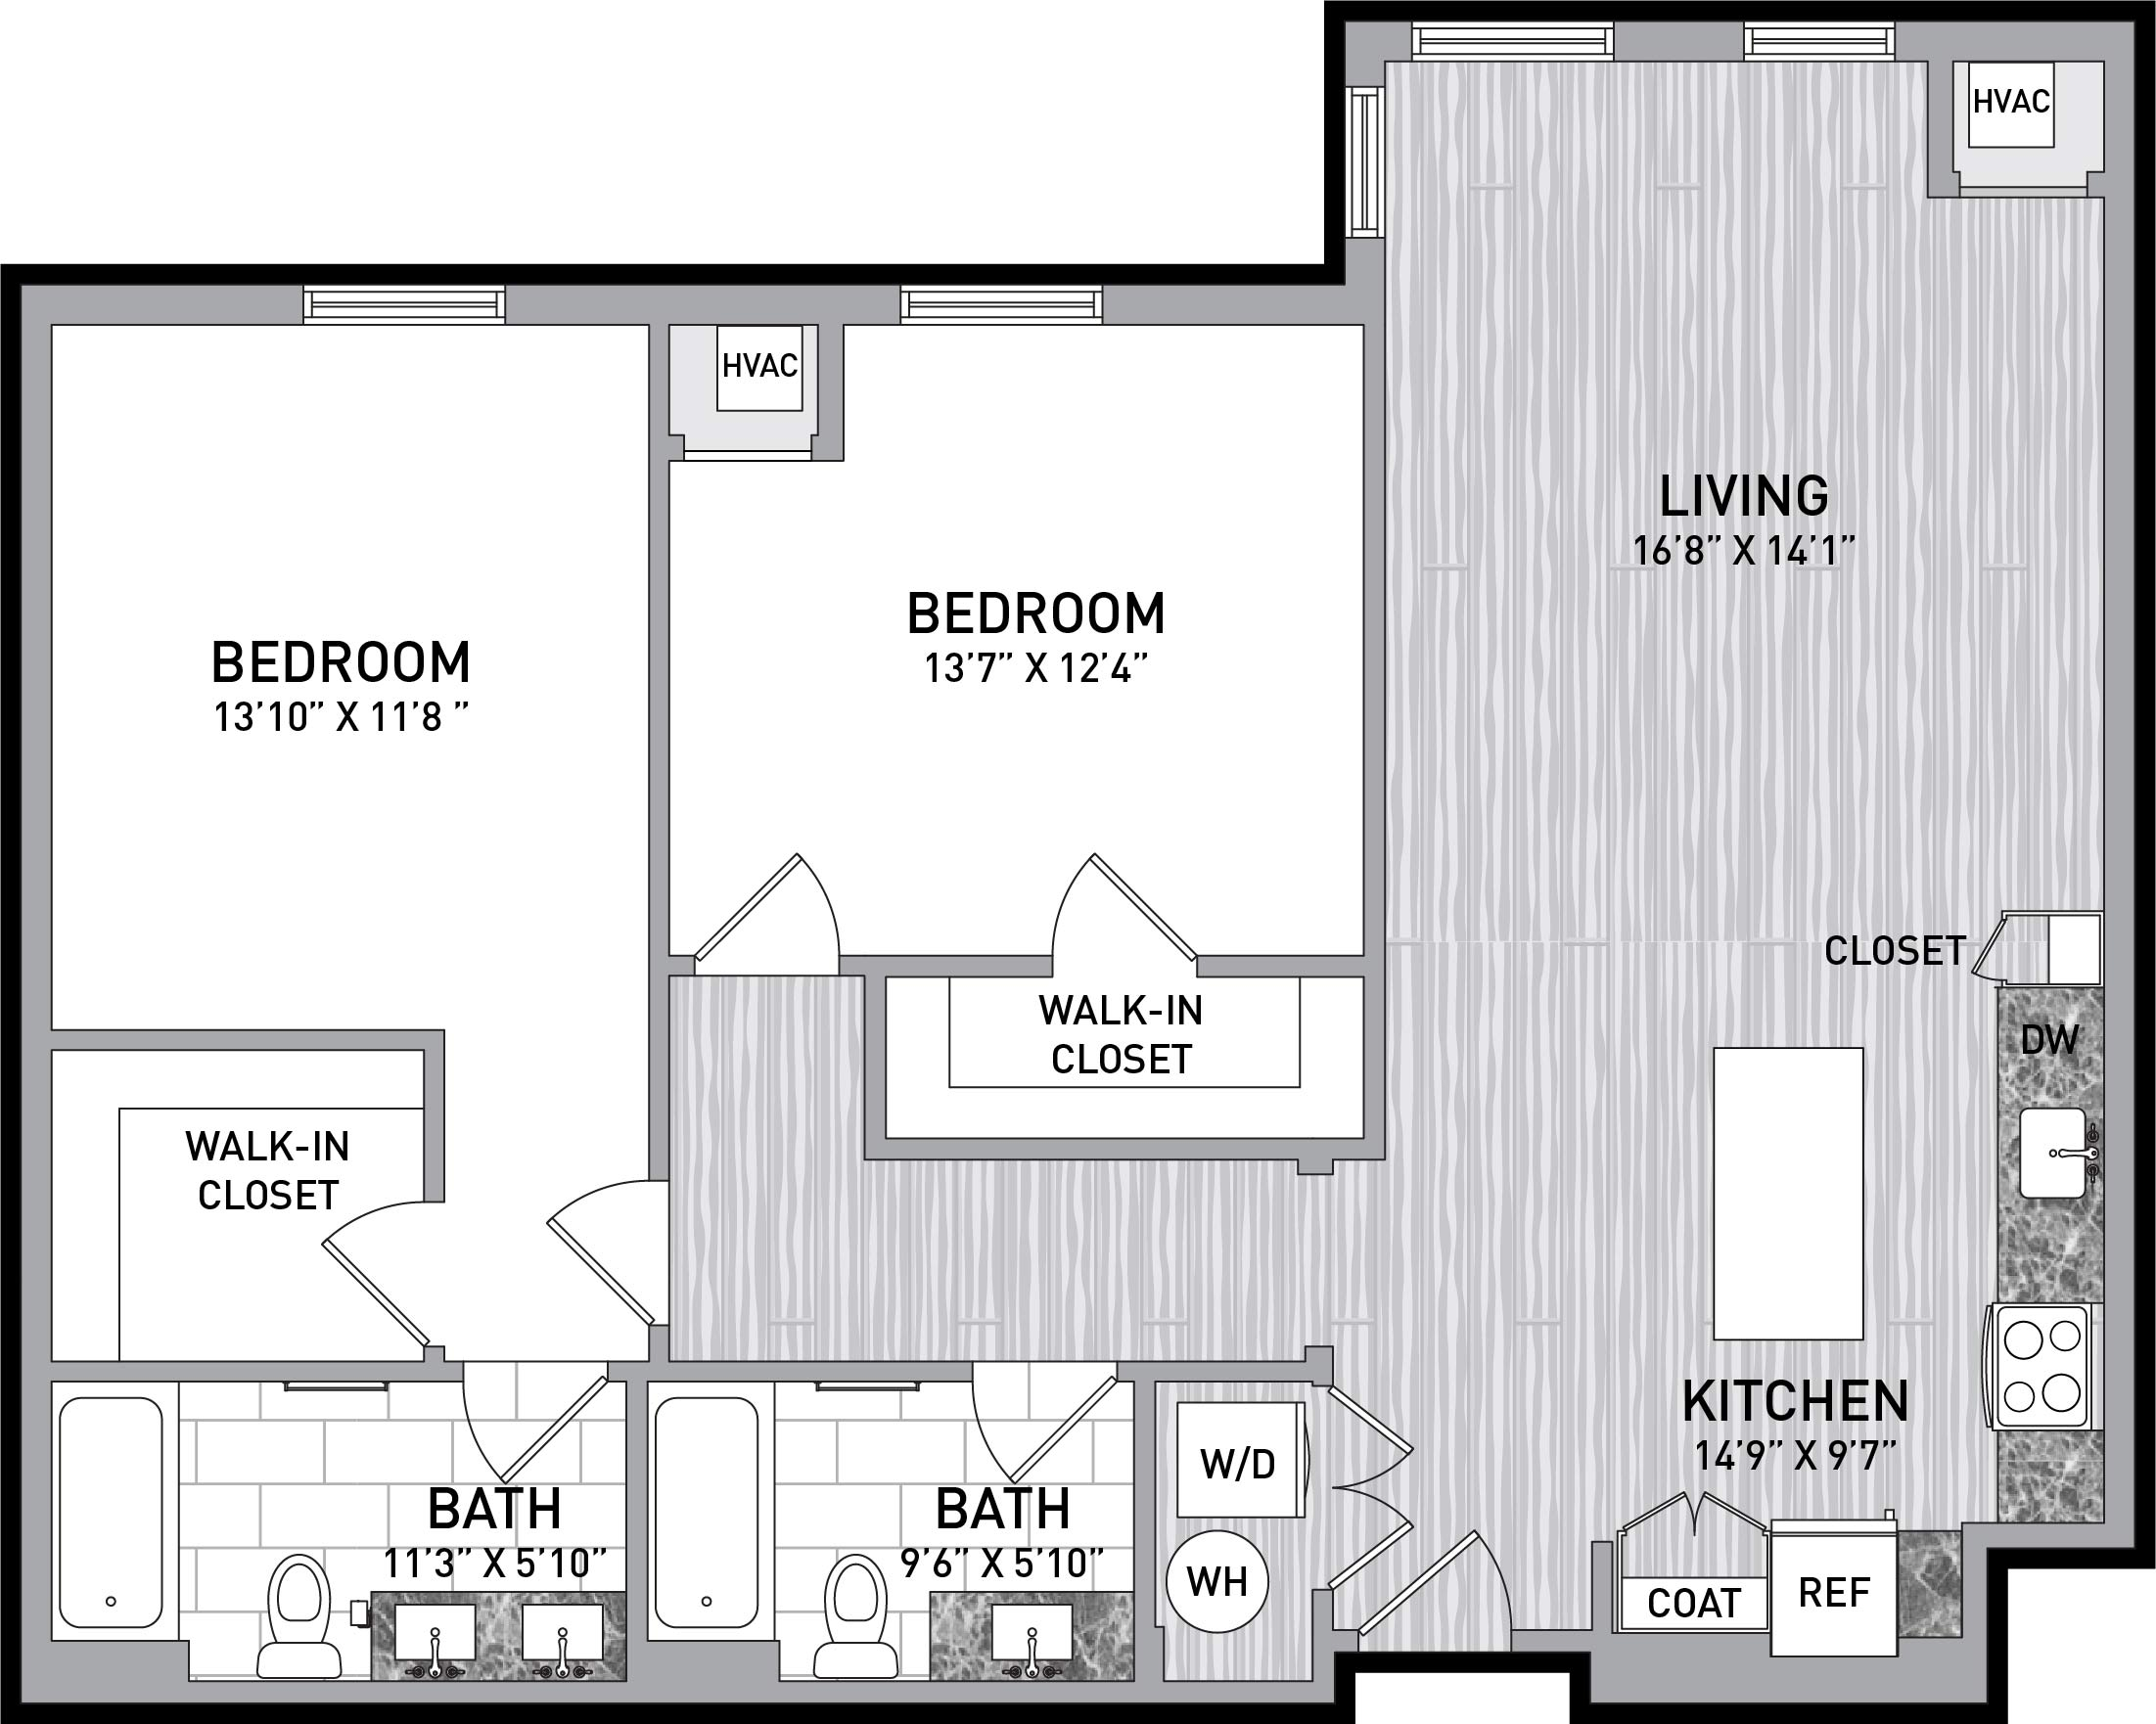 422 floorplan